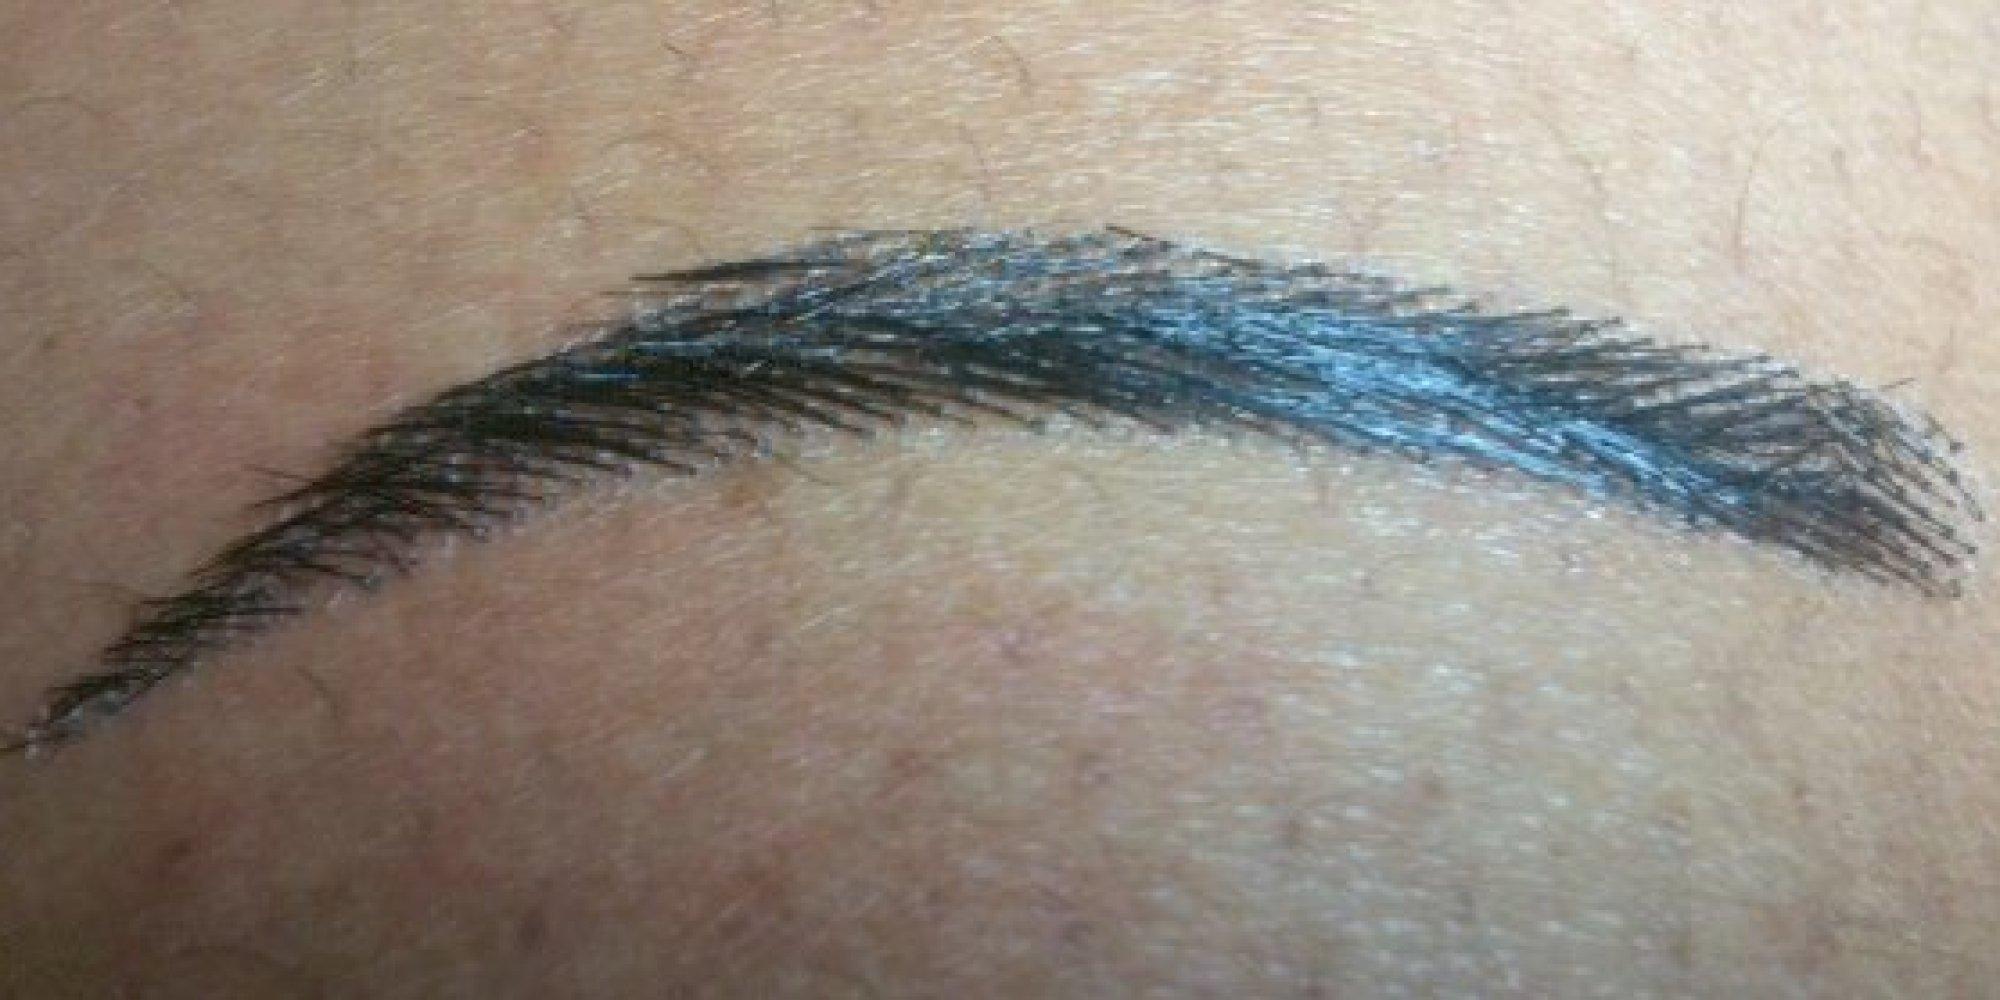 Crossdresser Wigs | HAIRSTYLE GALLERY